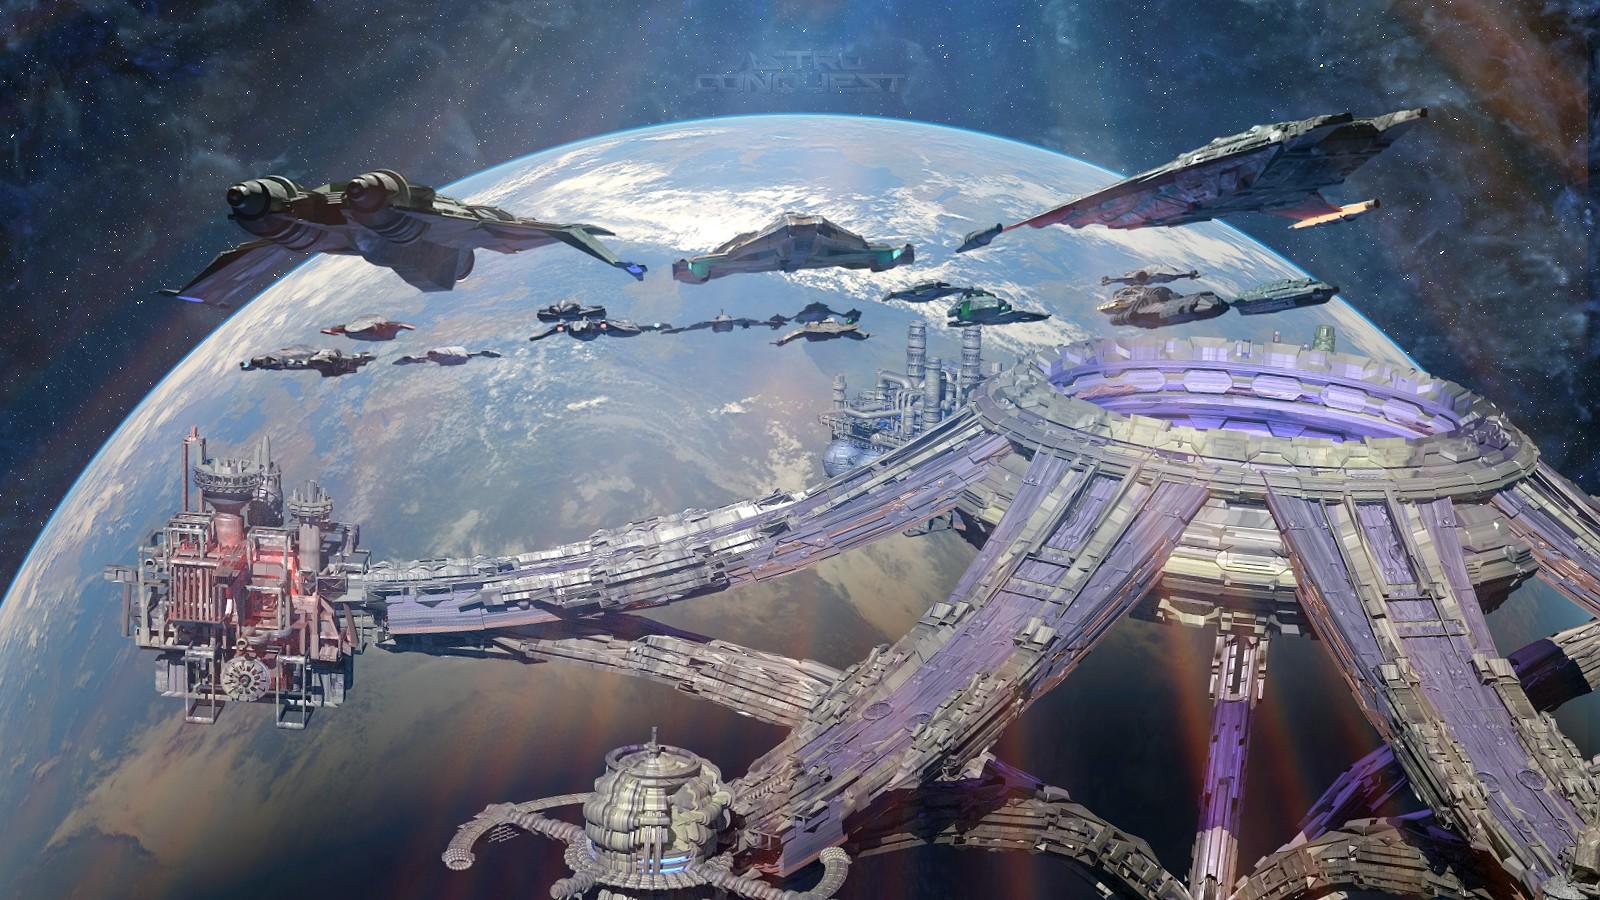 https://hilfe.astroconquest.com/astro-conquest-26.jpg